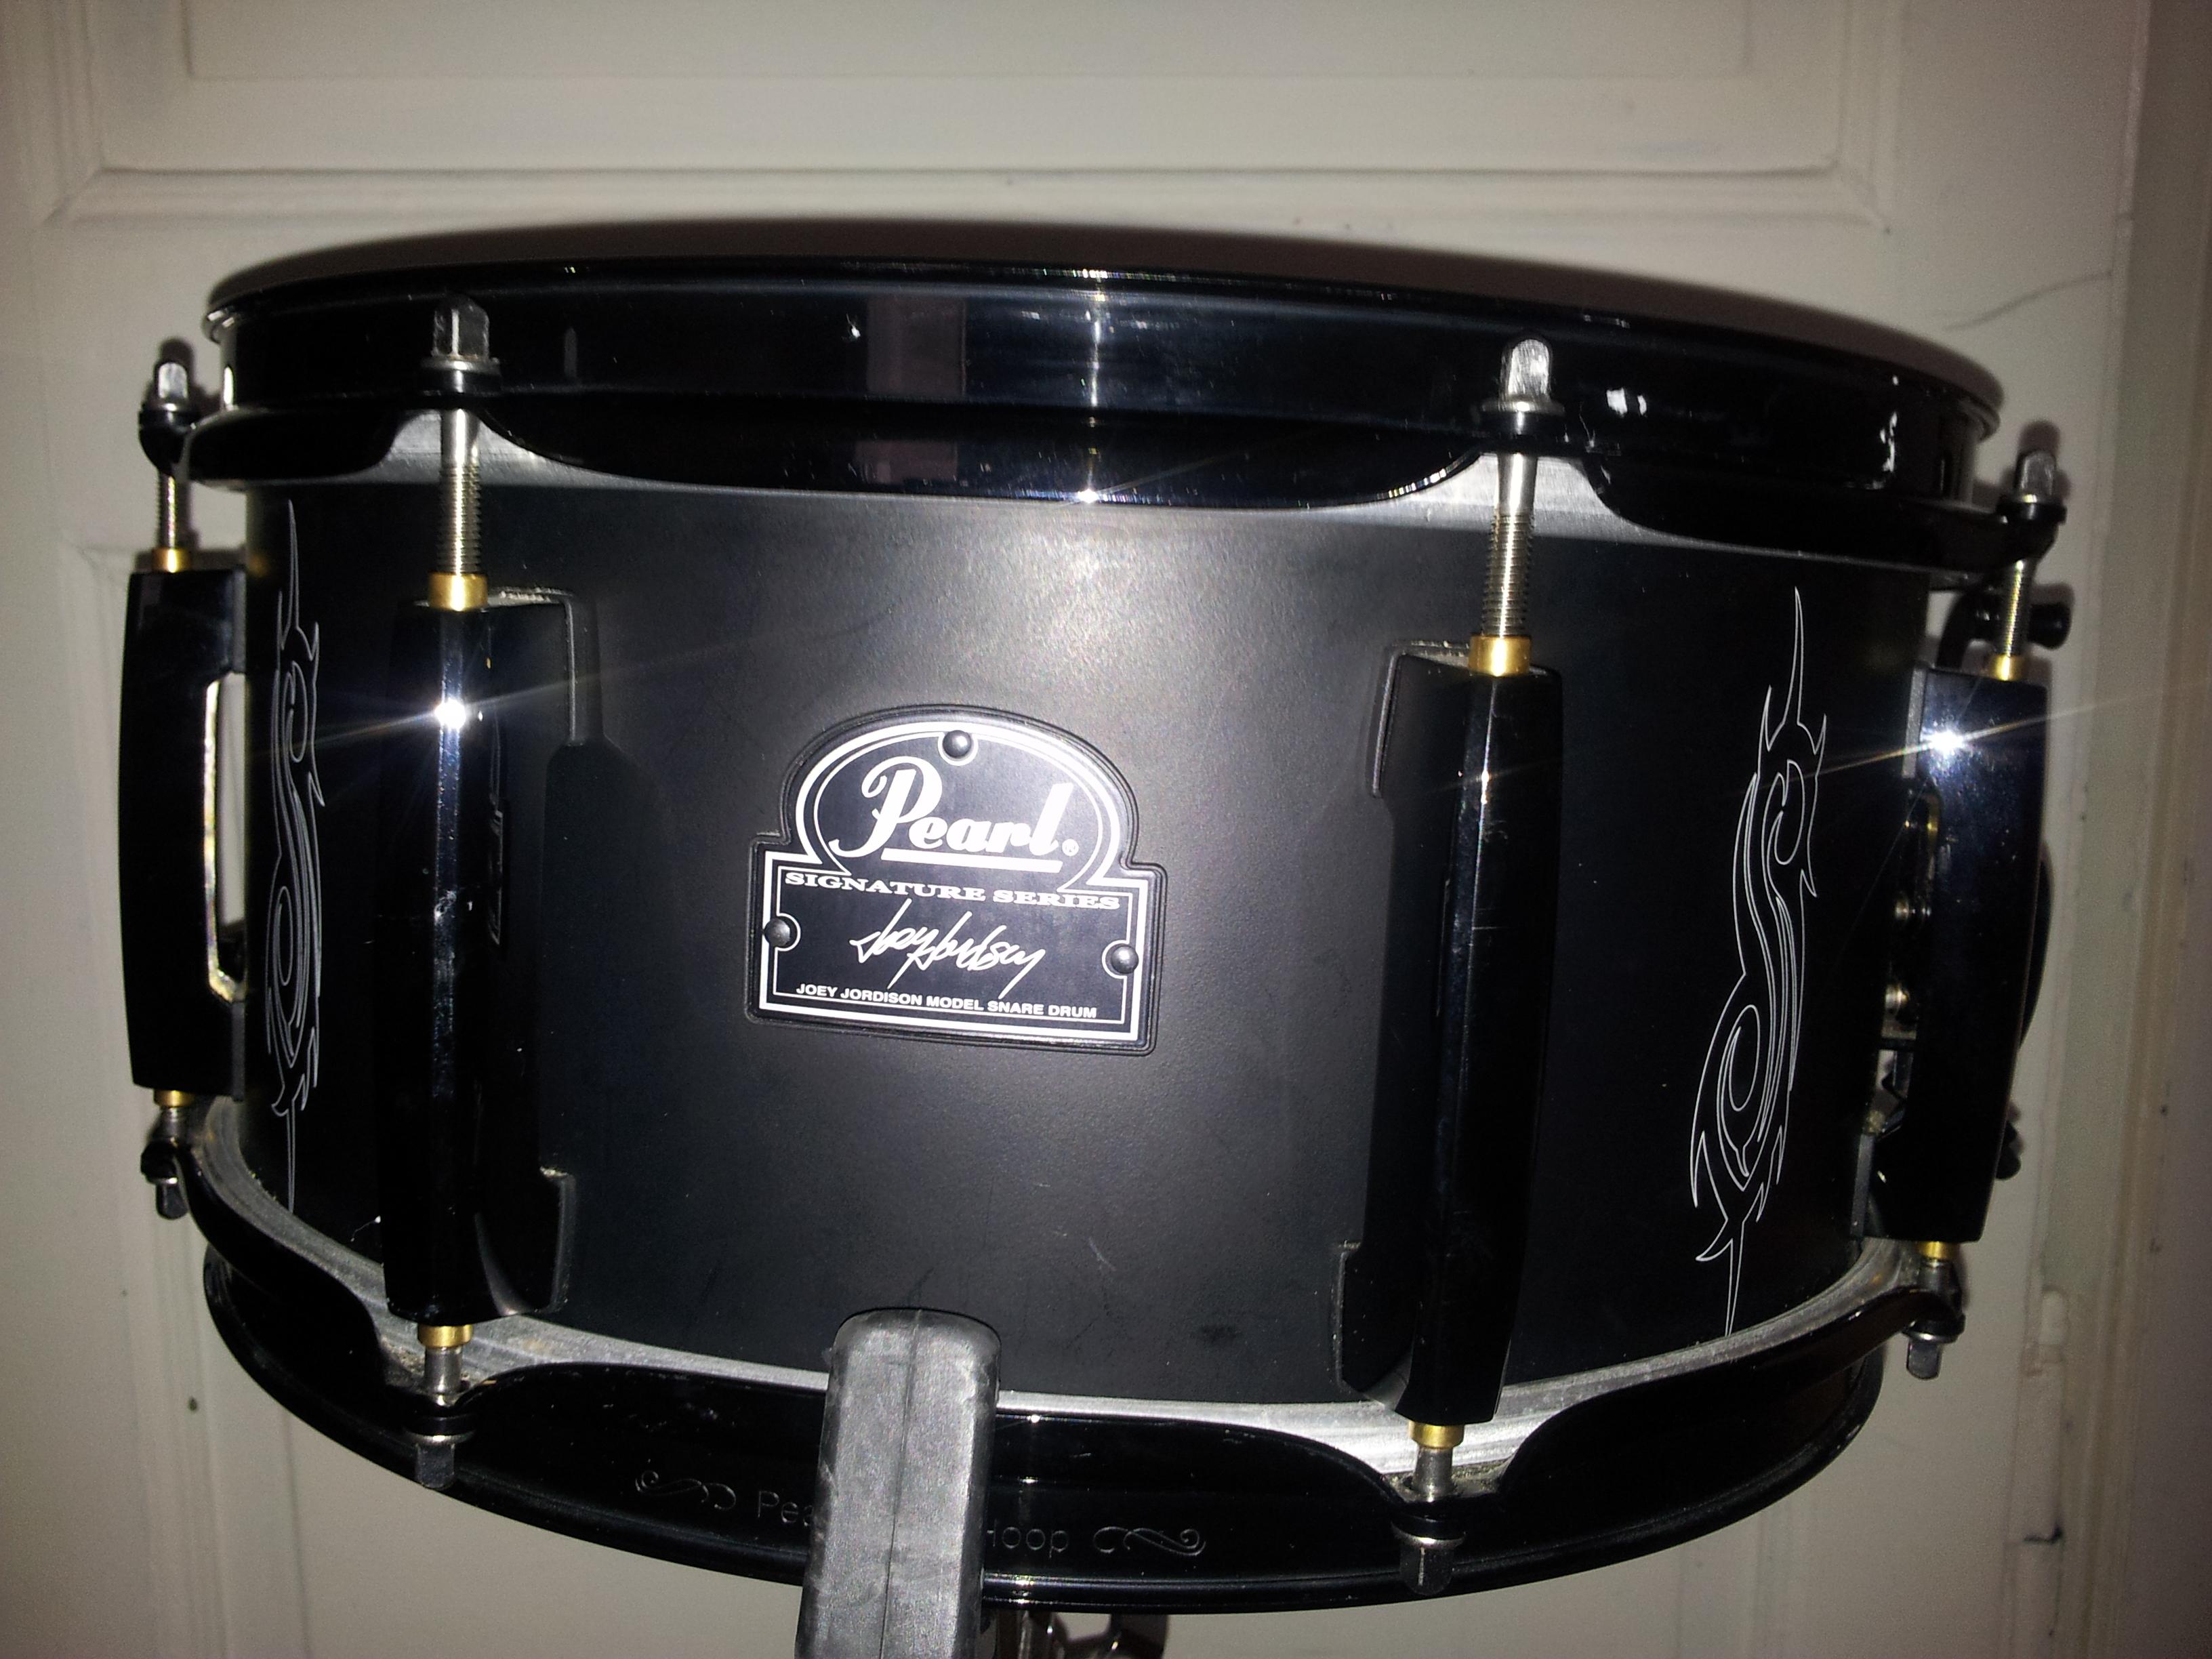 pearl jj1365 joey jordison snare signature image 1779332 audiofanzine. Black Bedroom Furniture Sets. Home Design Ideas